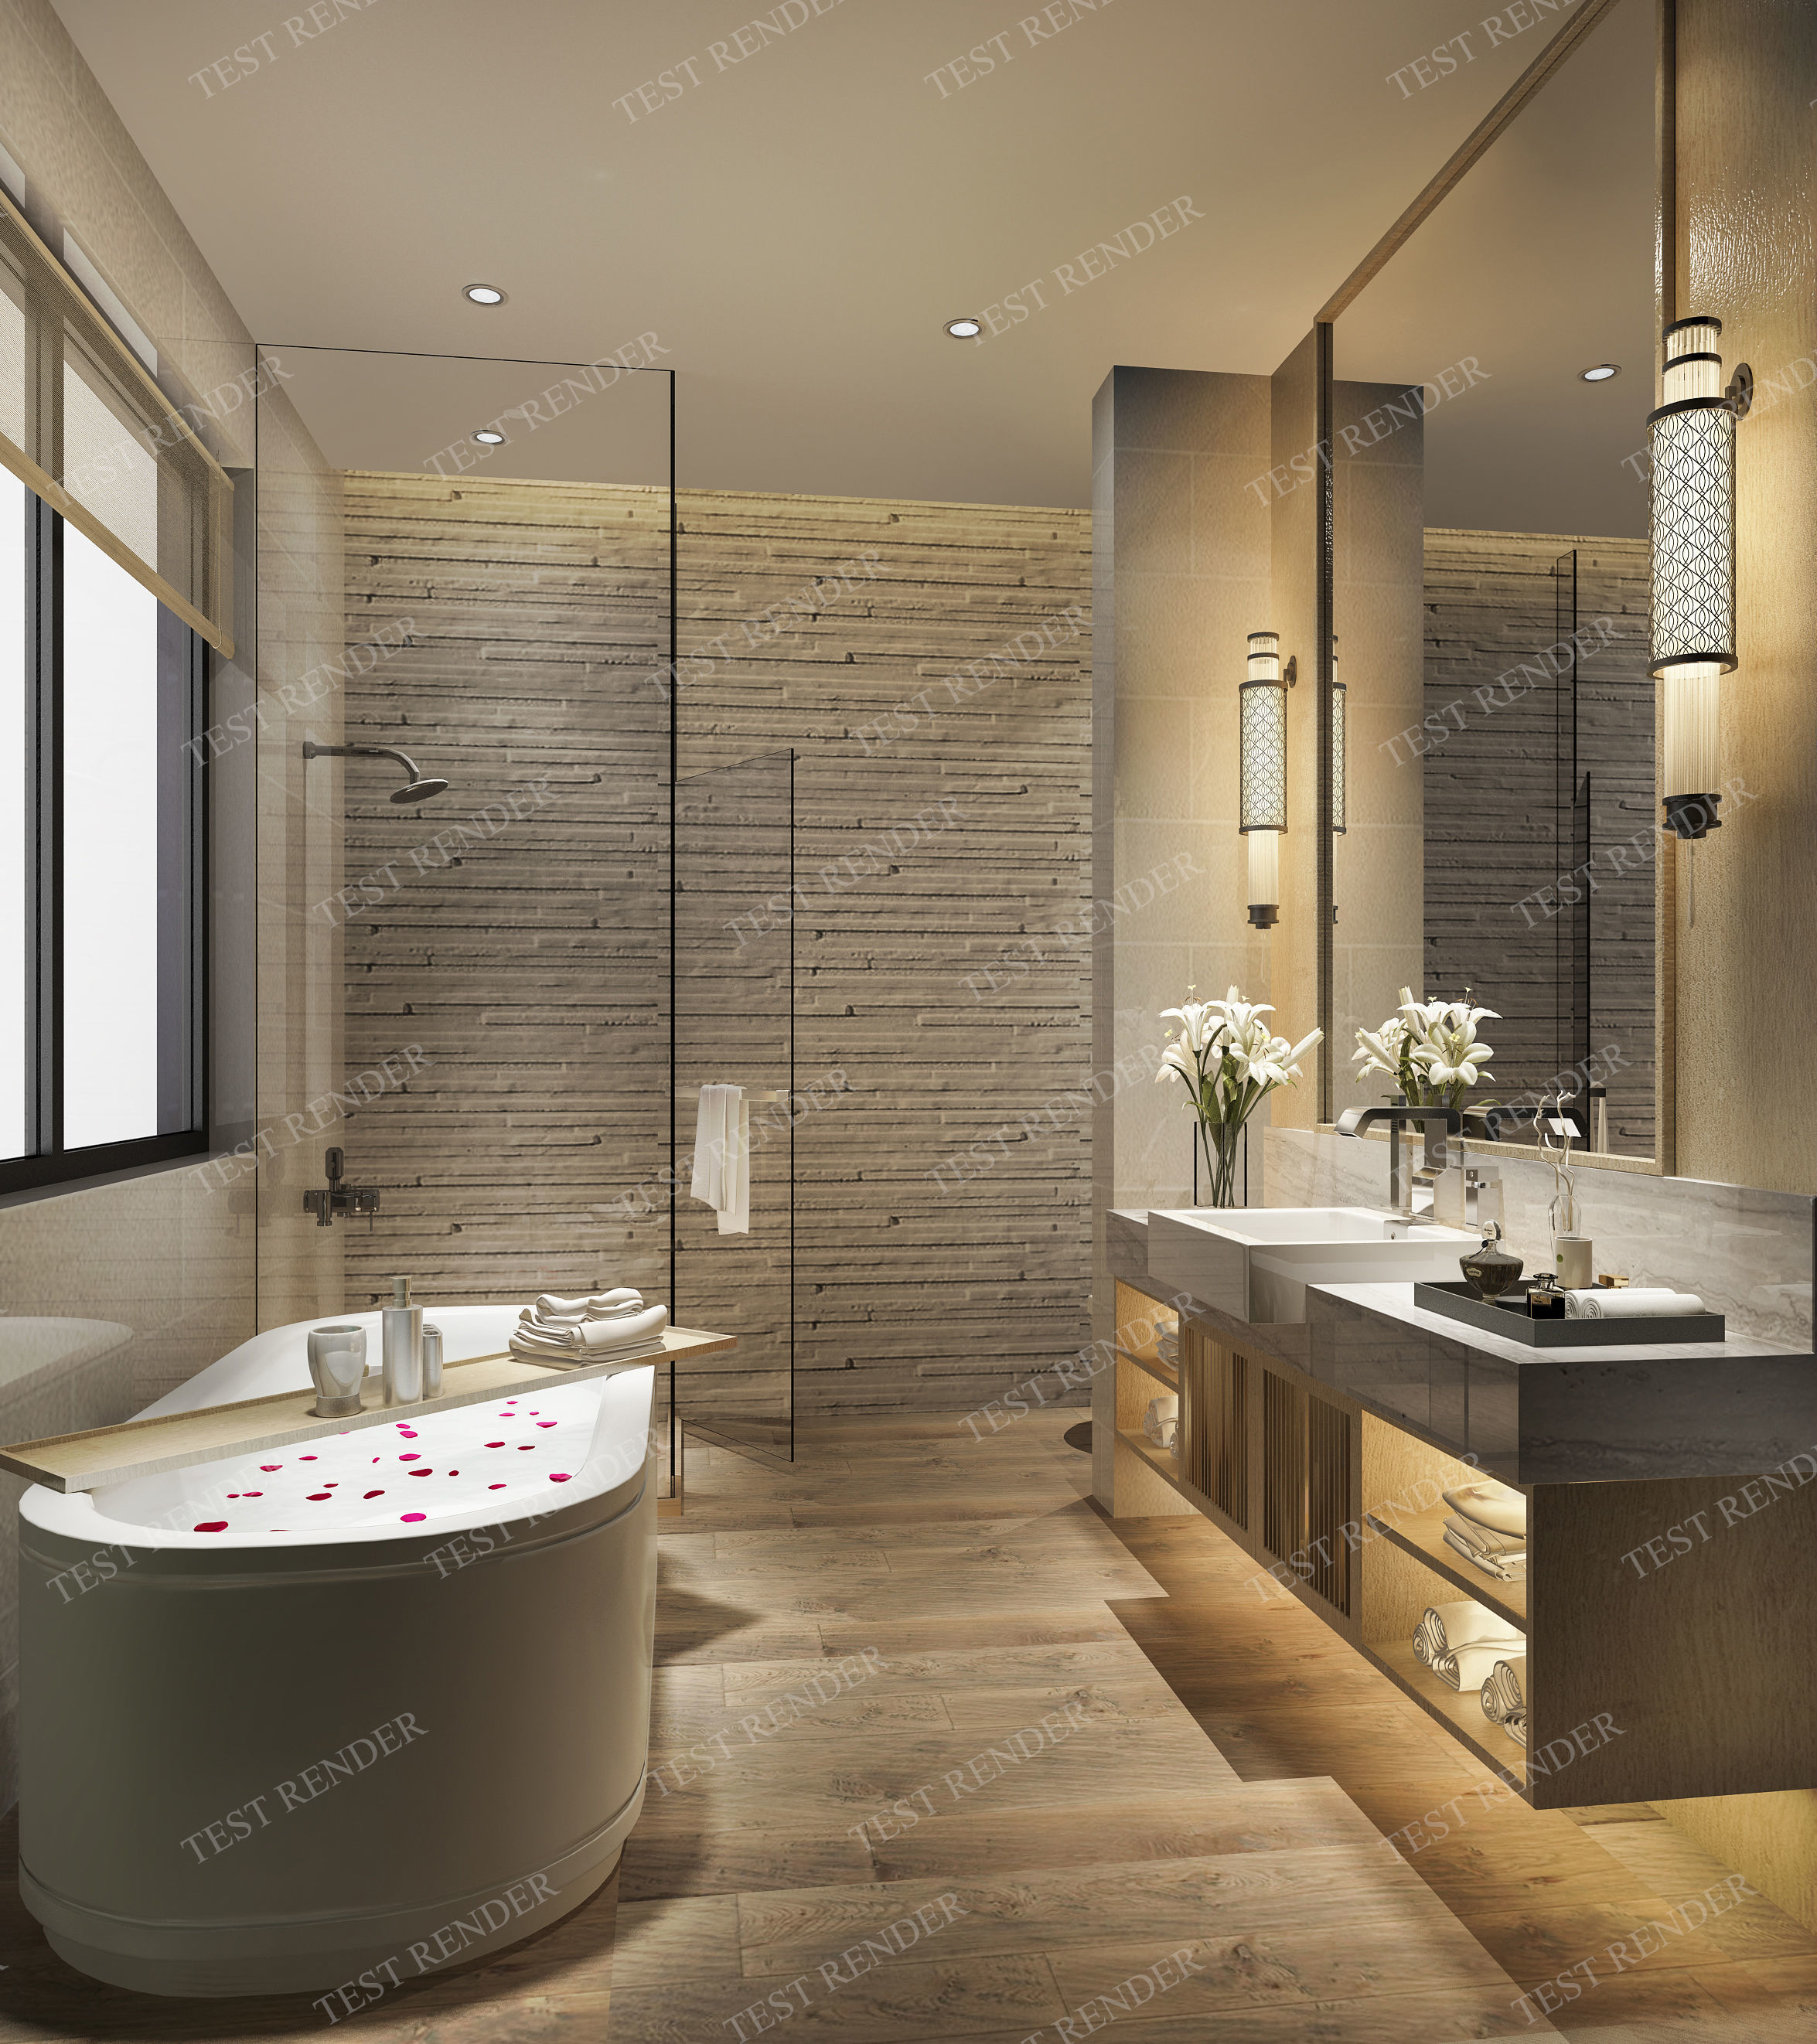 3D Modern luxury marble toilet and bathroom decor